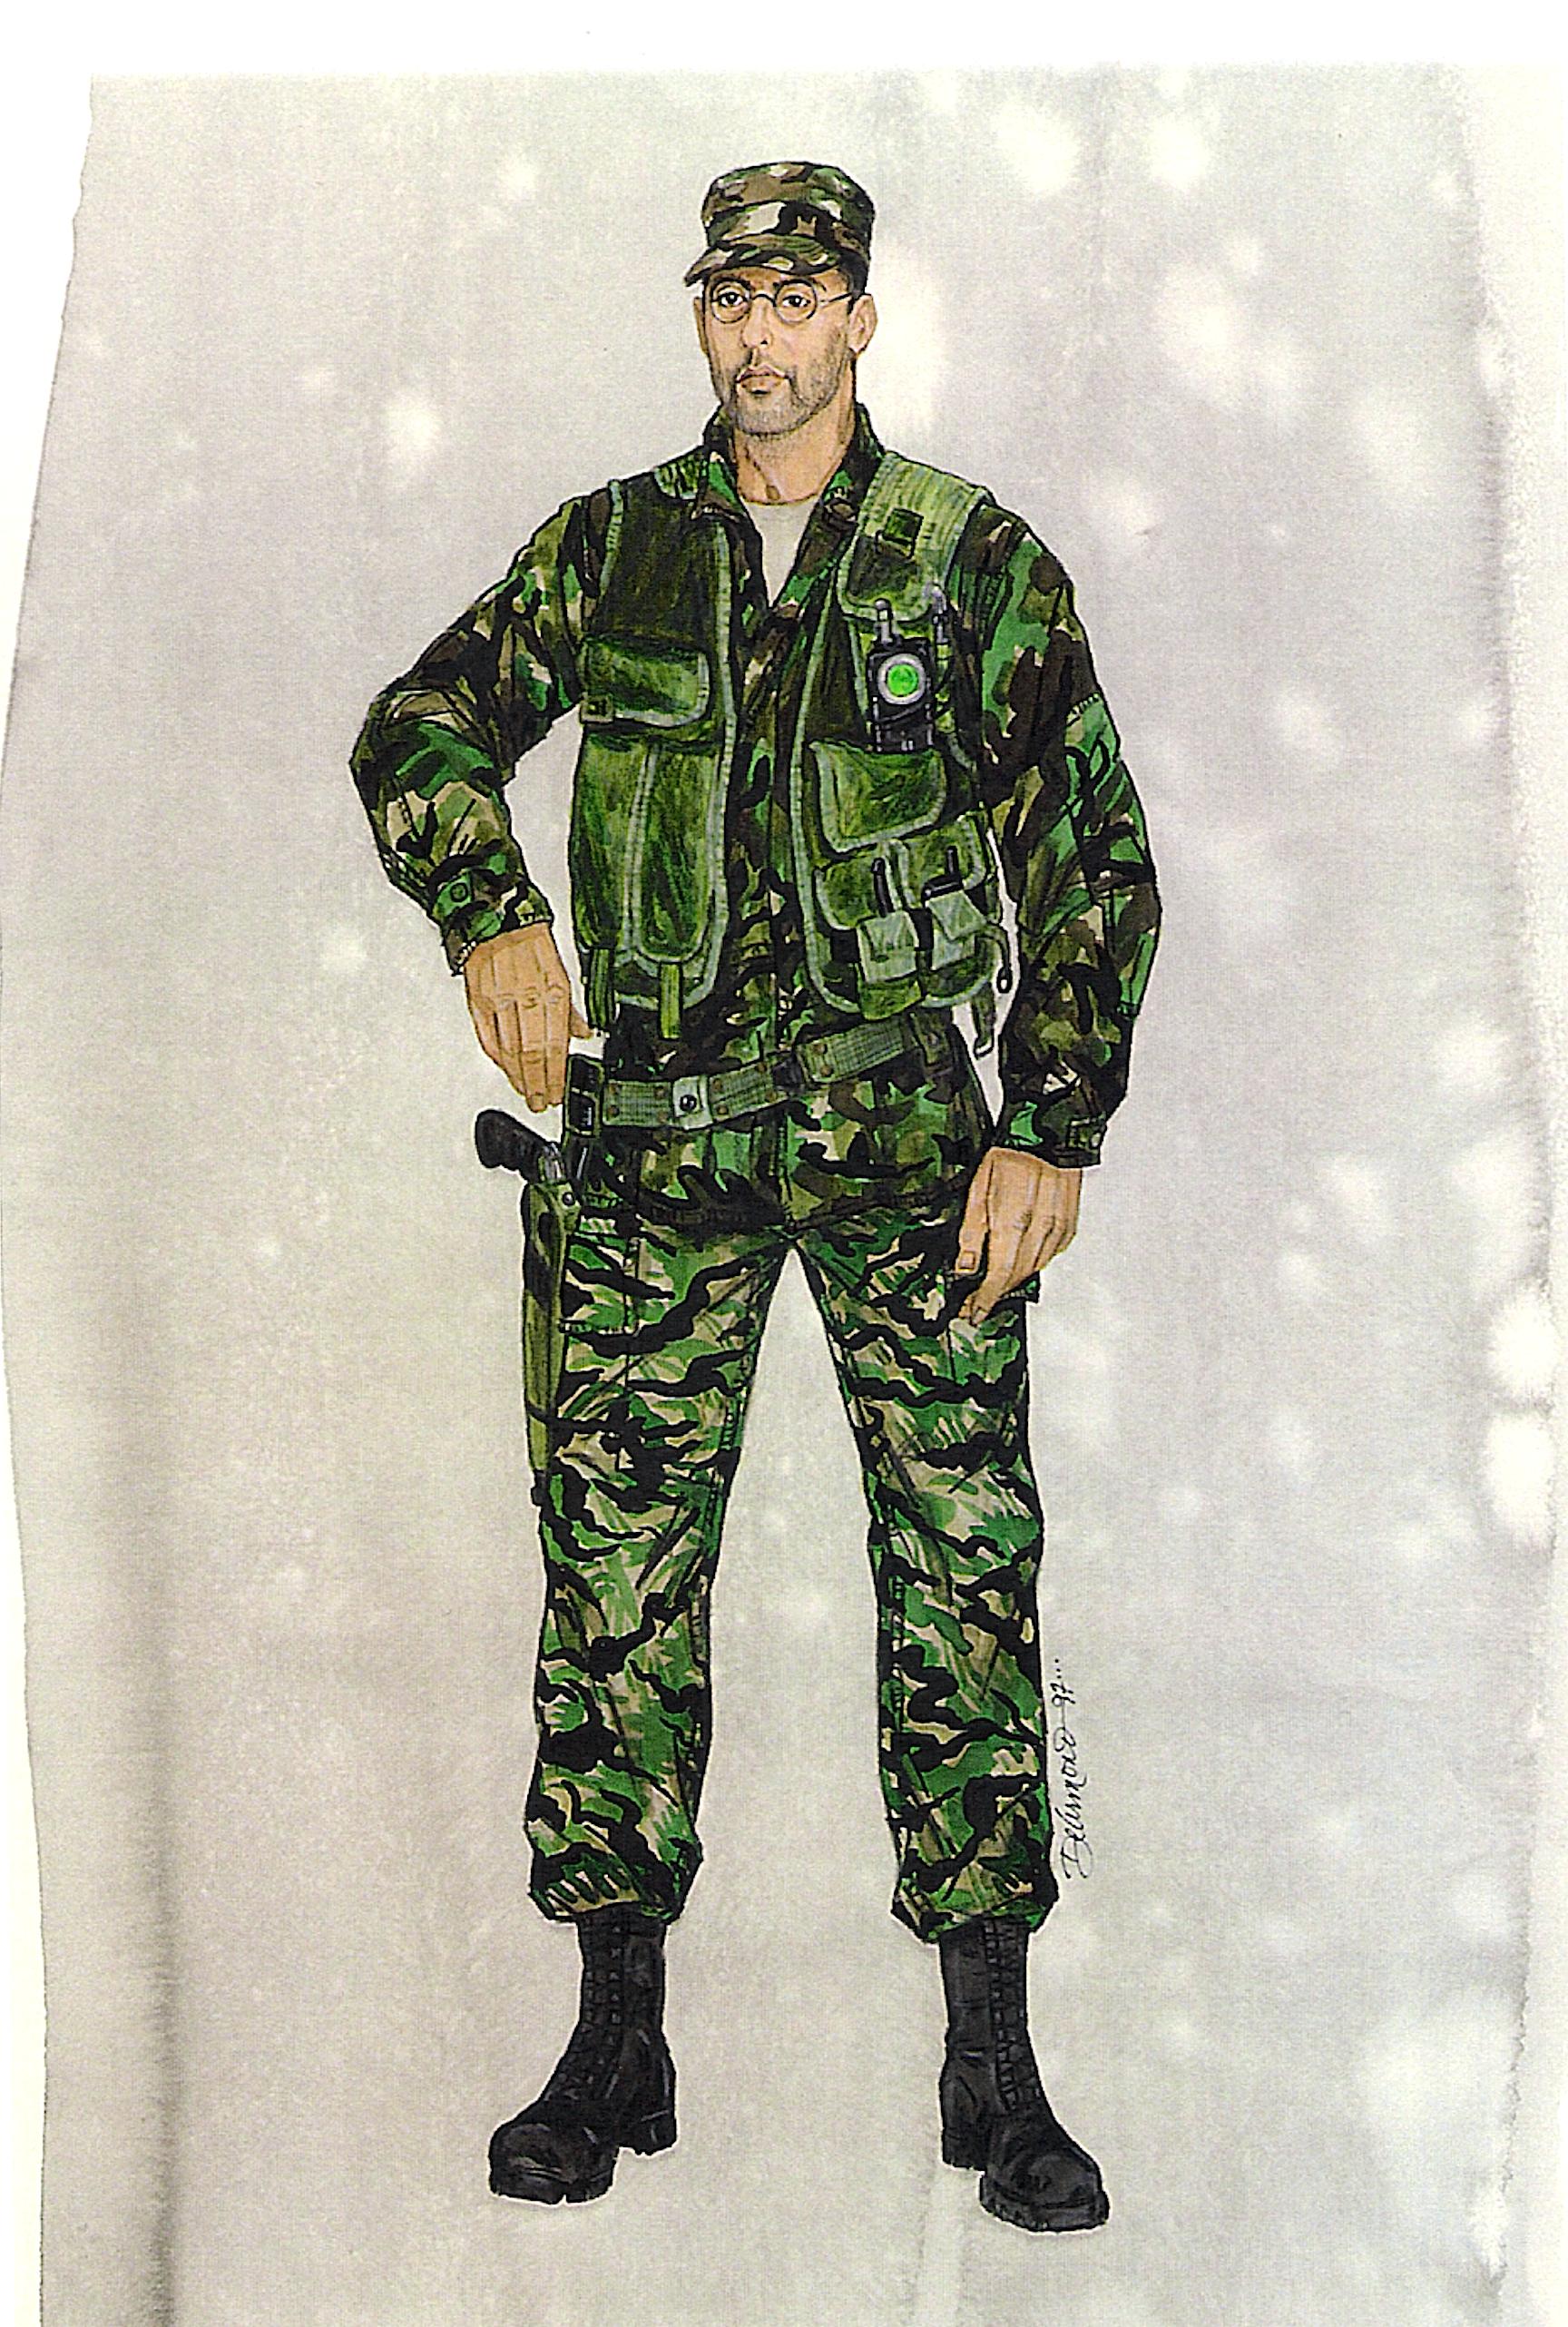 Godzilla,  Jean Reno uniform option.  #josephporrodesigns